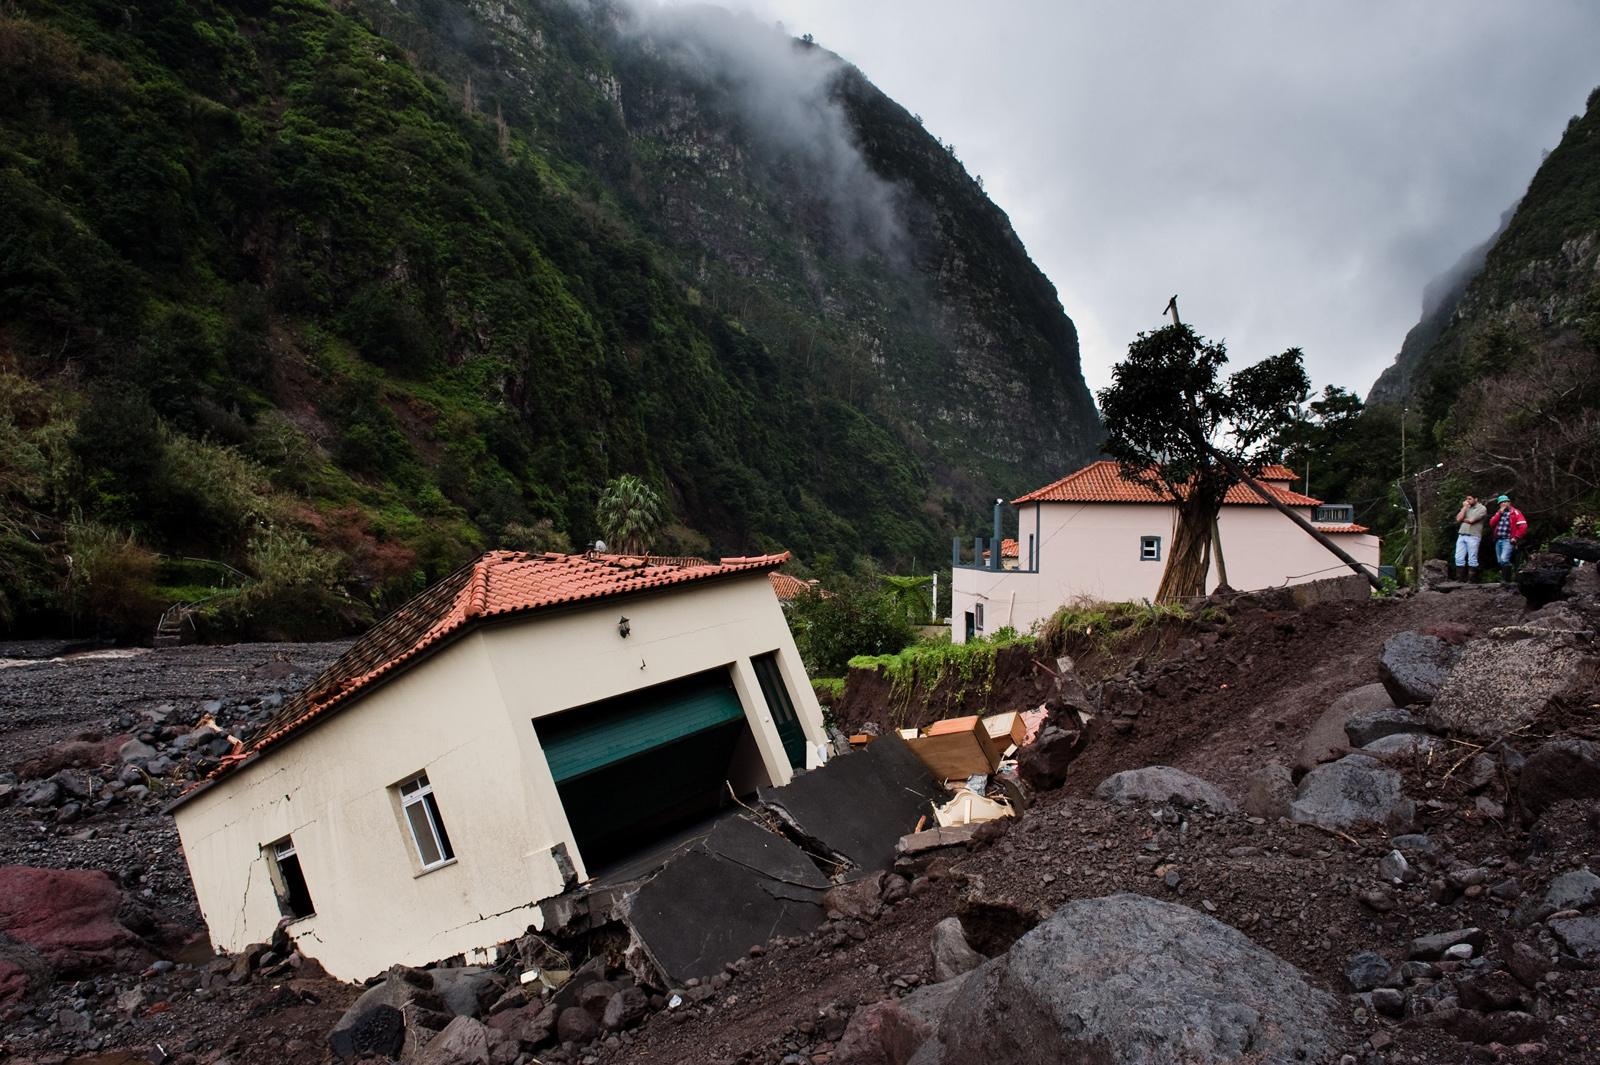 FLOODS IN MADEIRA ISLAND